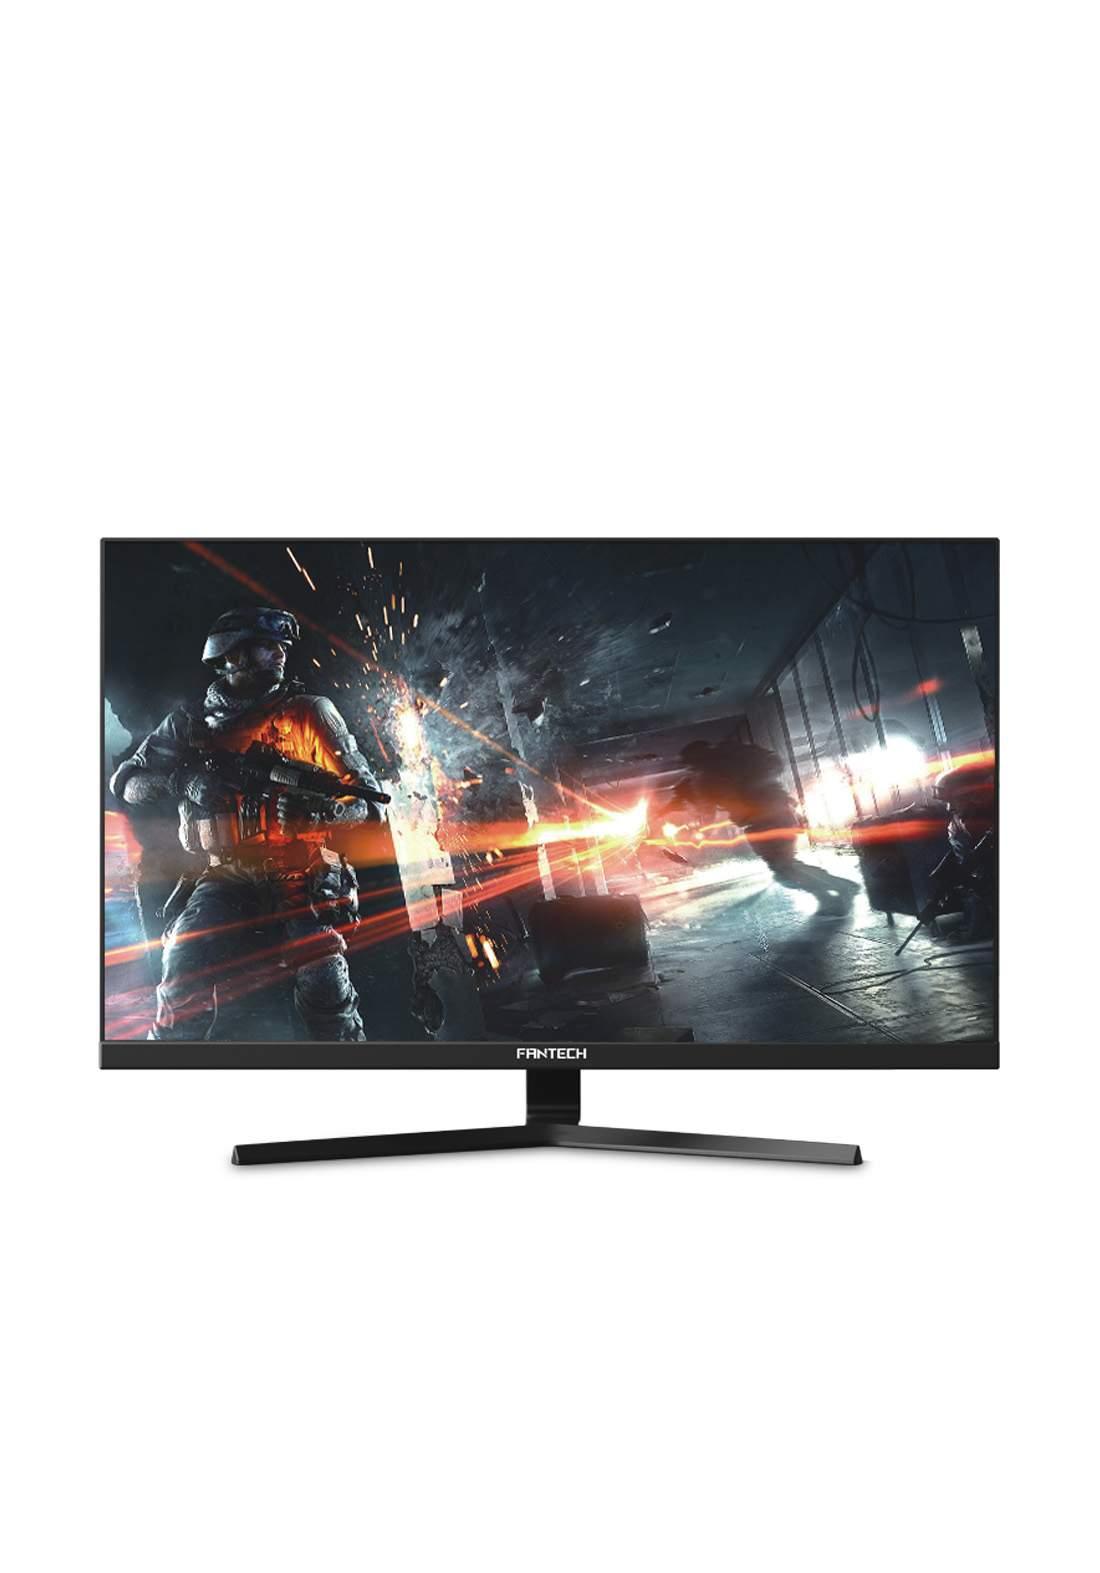 Fantech GM271SF Flat Chimera Gaming Monitorr 27 - Black